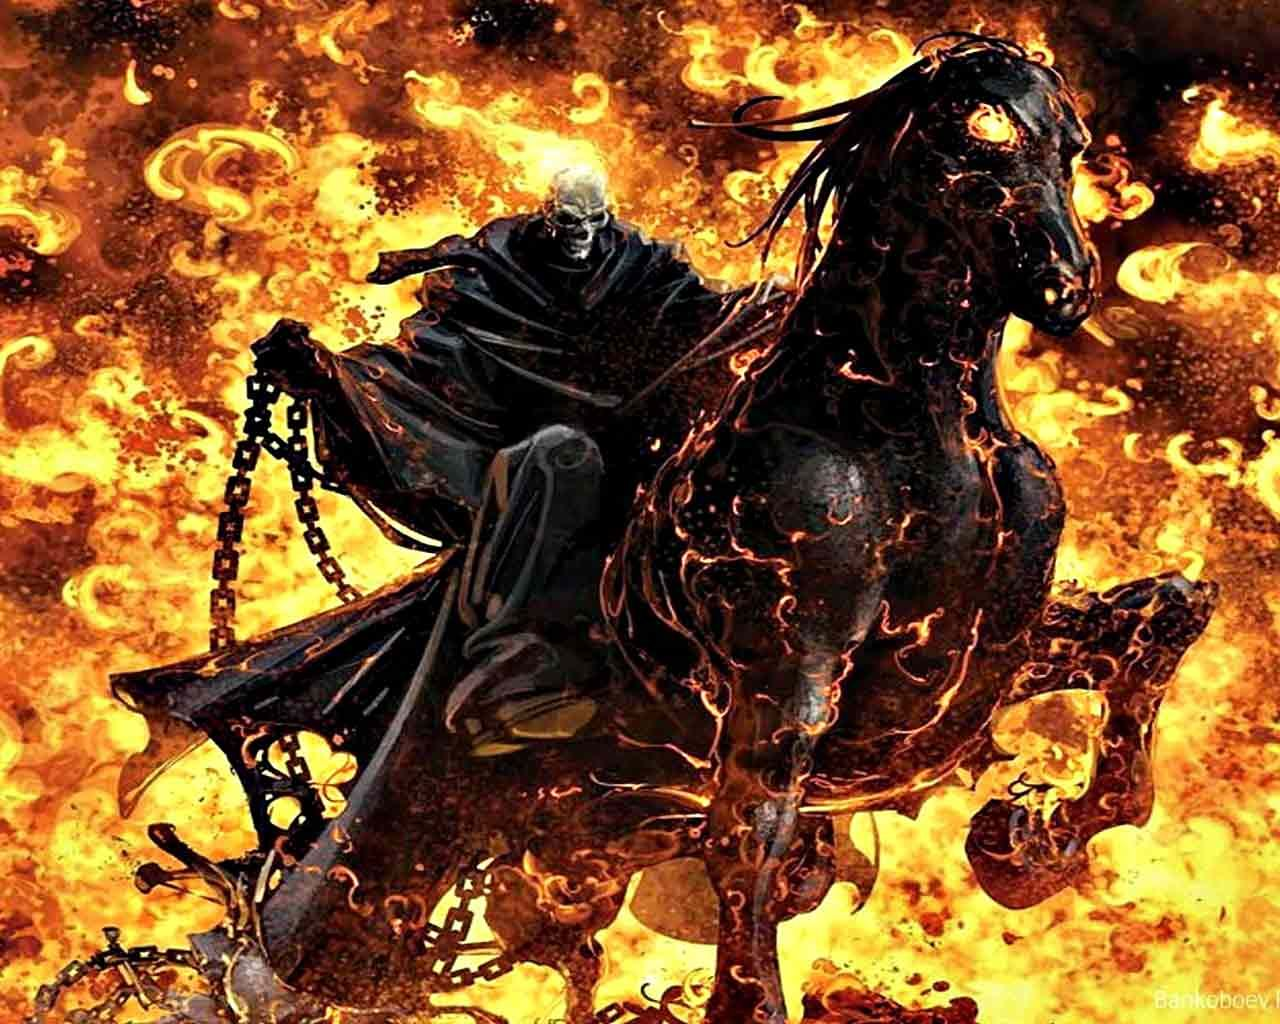 Beautiful Wallpaper Horse Ghost Rider - 8e40b07e55faac96045b71ff2ff9e8f5  Pic_672210.jpg